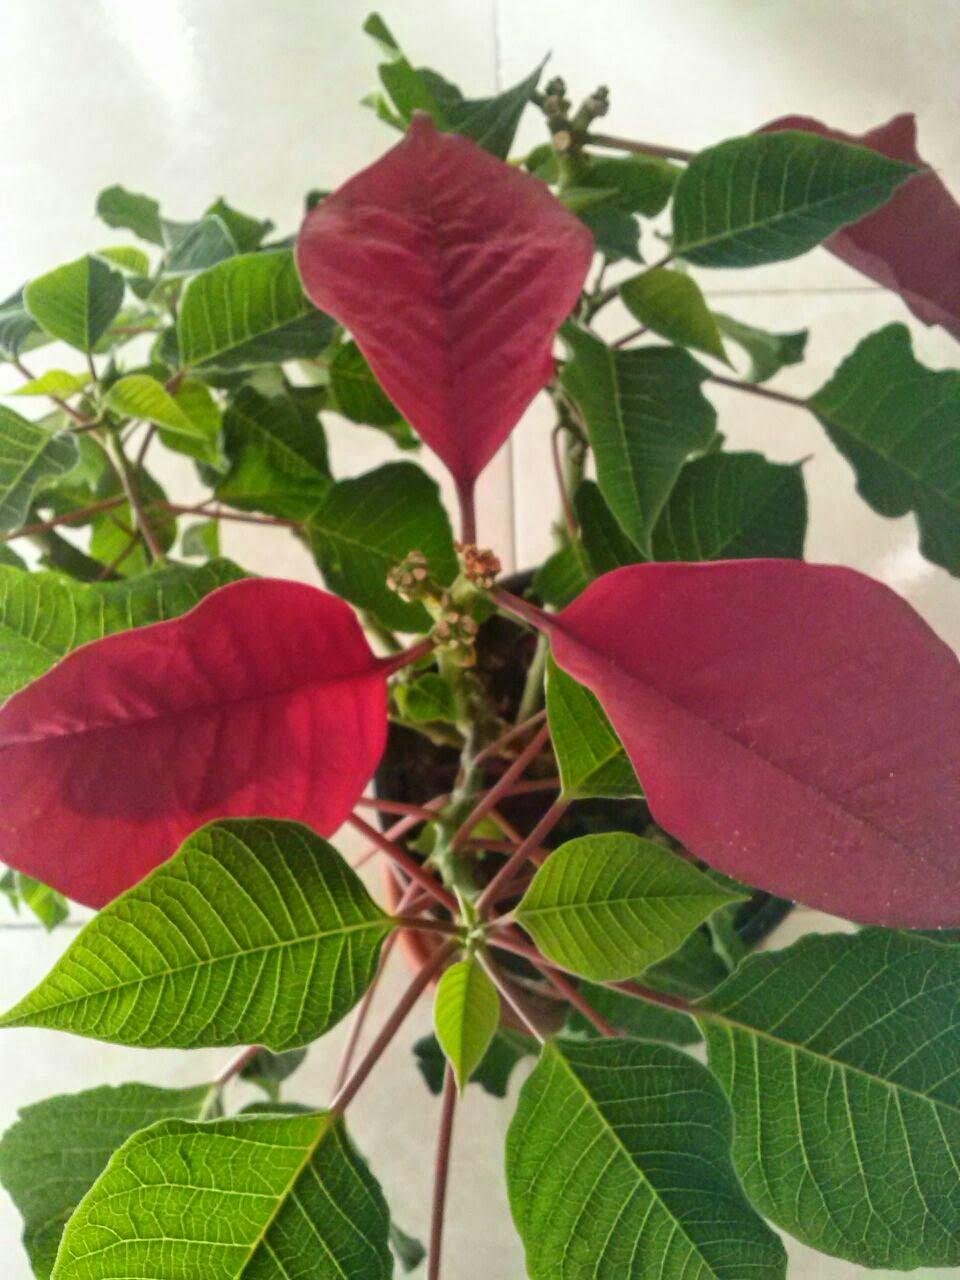 Flor de pascua (Euphorbia pulcherrima)